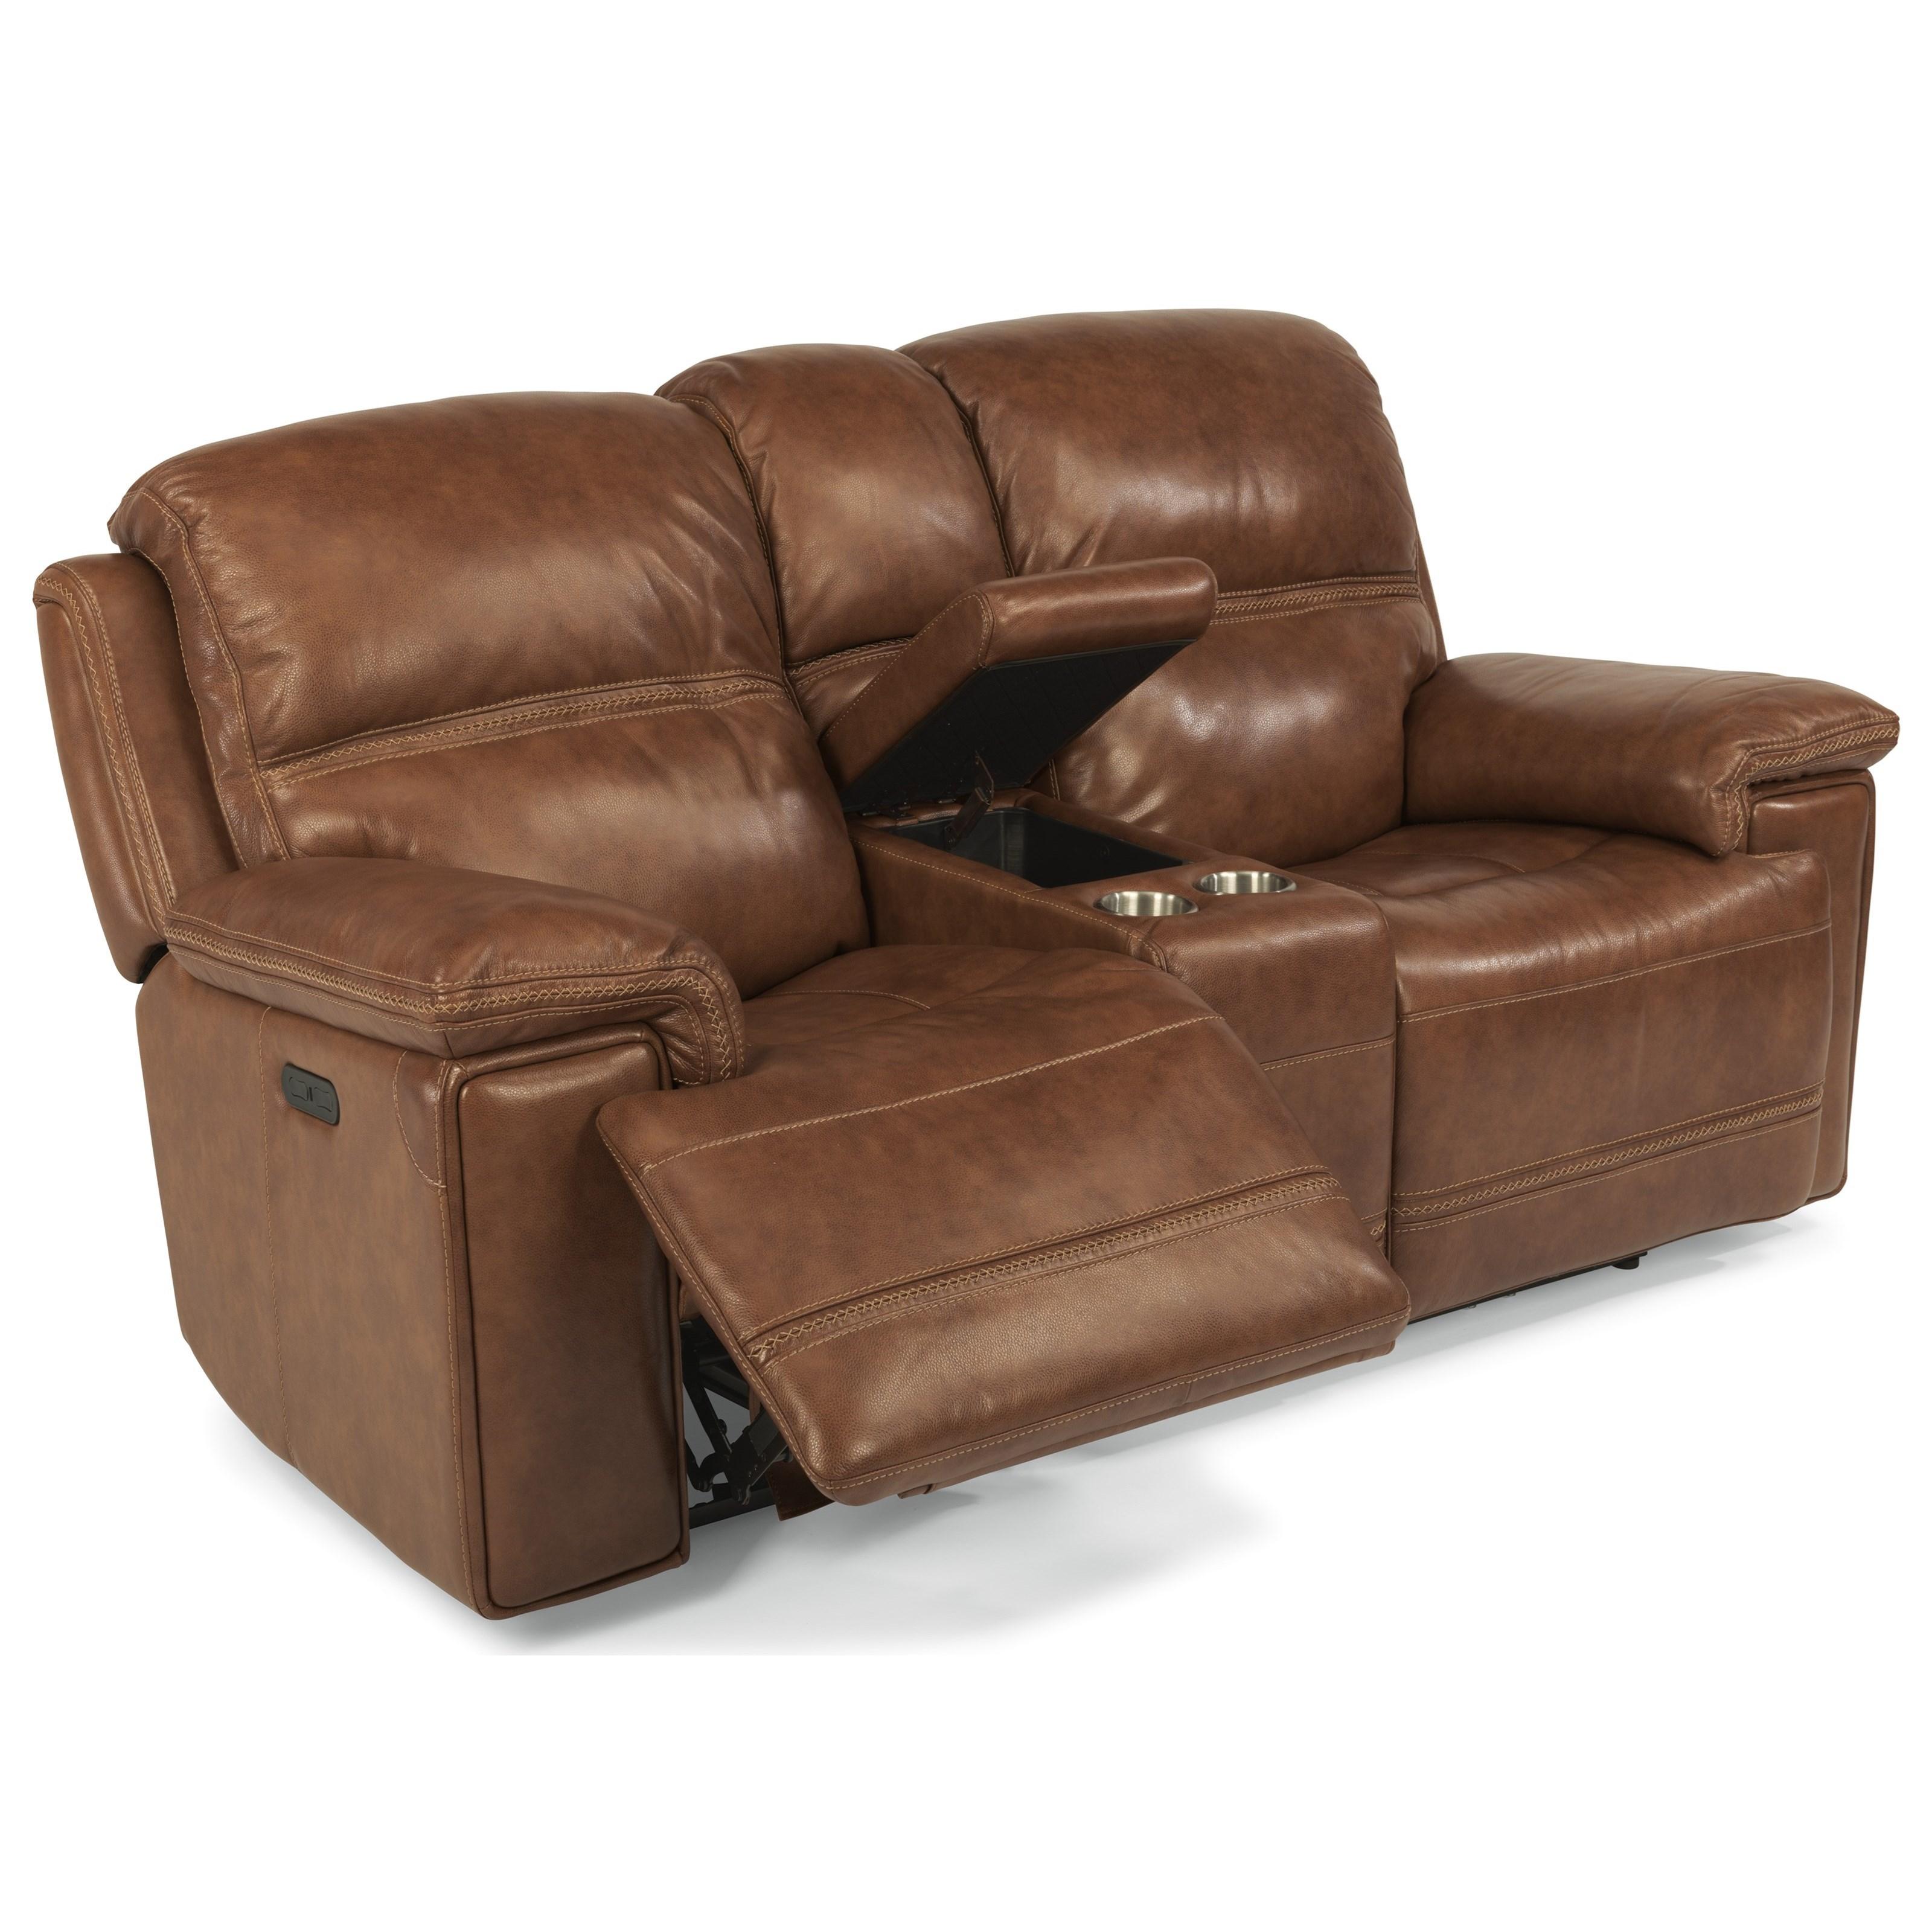 flexsteel sofa sets mattress warehouse in columbus georgia latitudes fenwick power reclining loveseat with